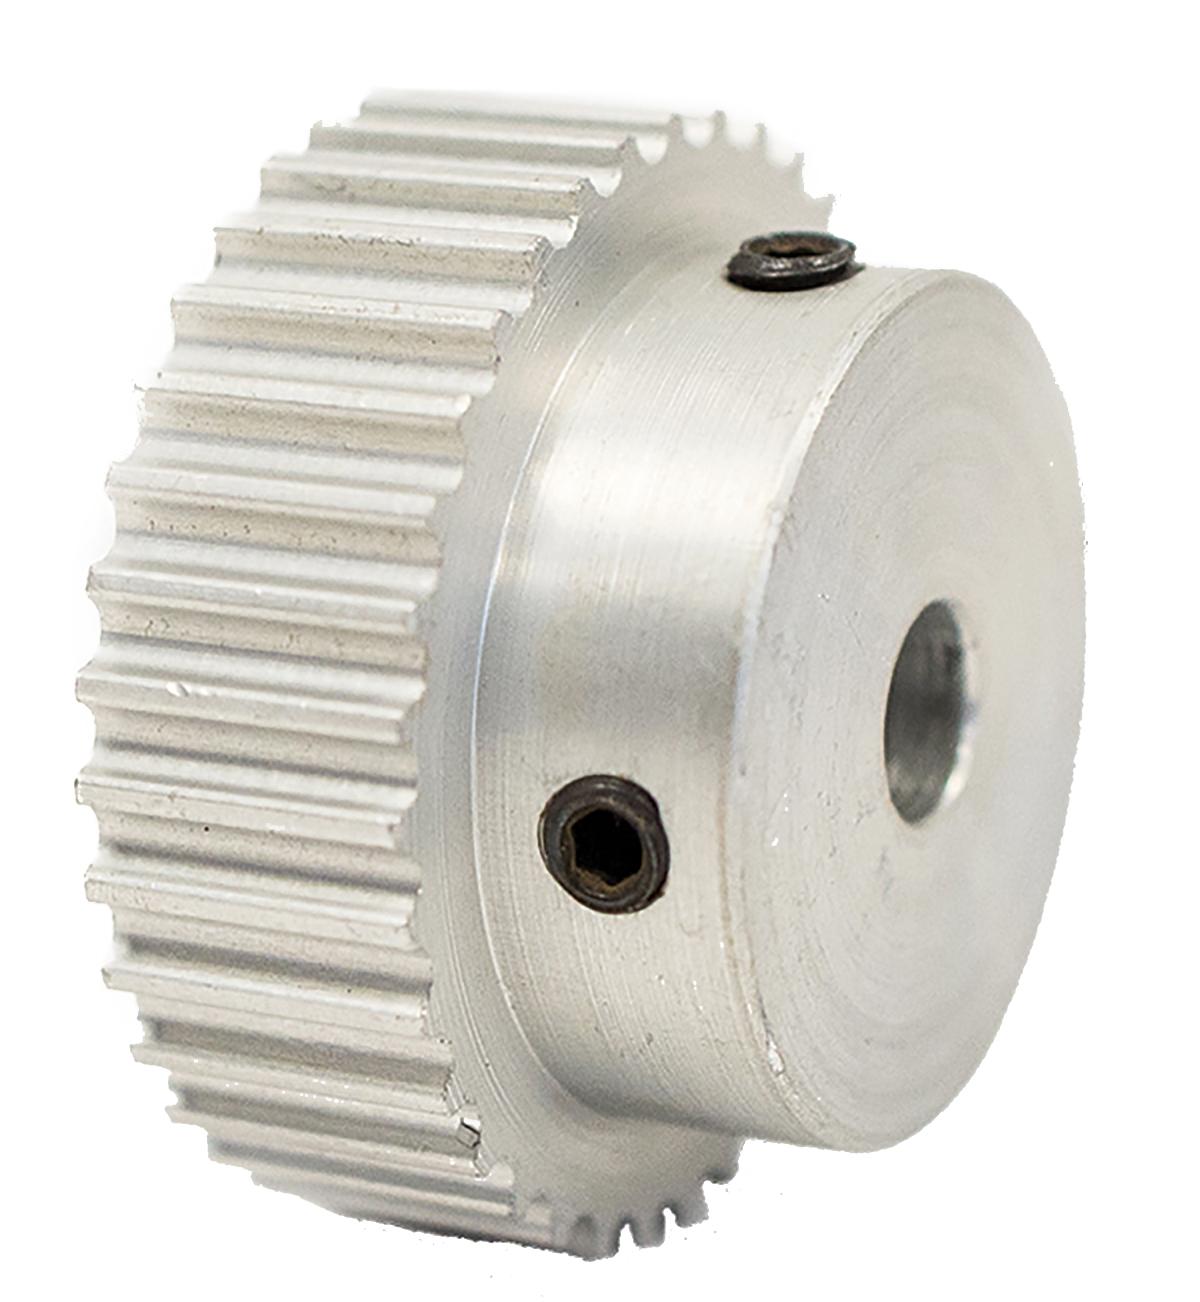 36-3P06-6A3 - Aluminum Powerhouse® Pulleys